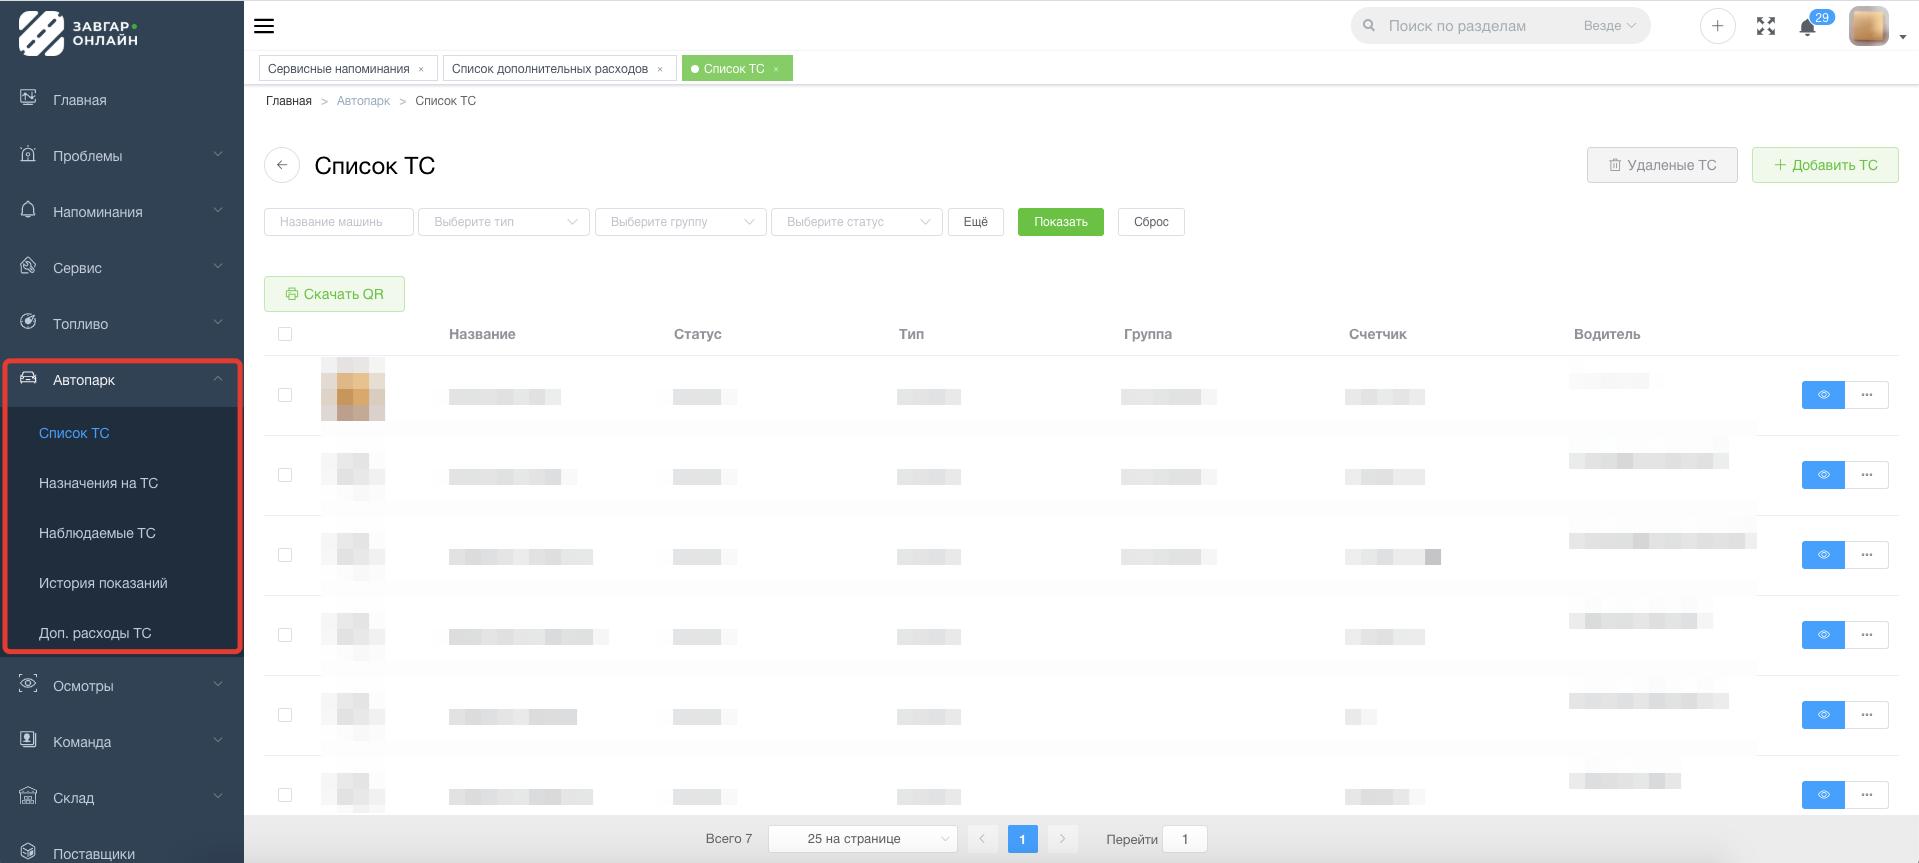 Модуль Автопарк в системе Завгар Онлайн